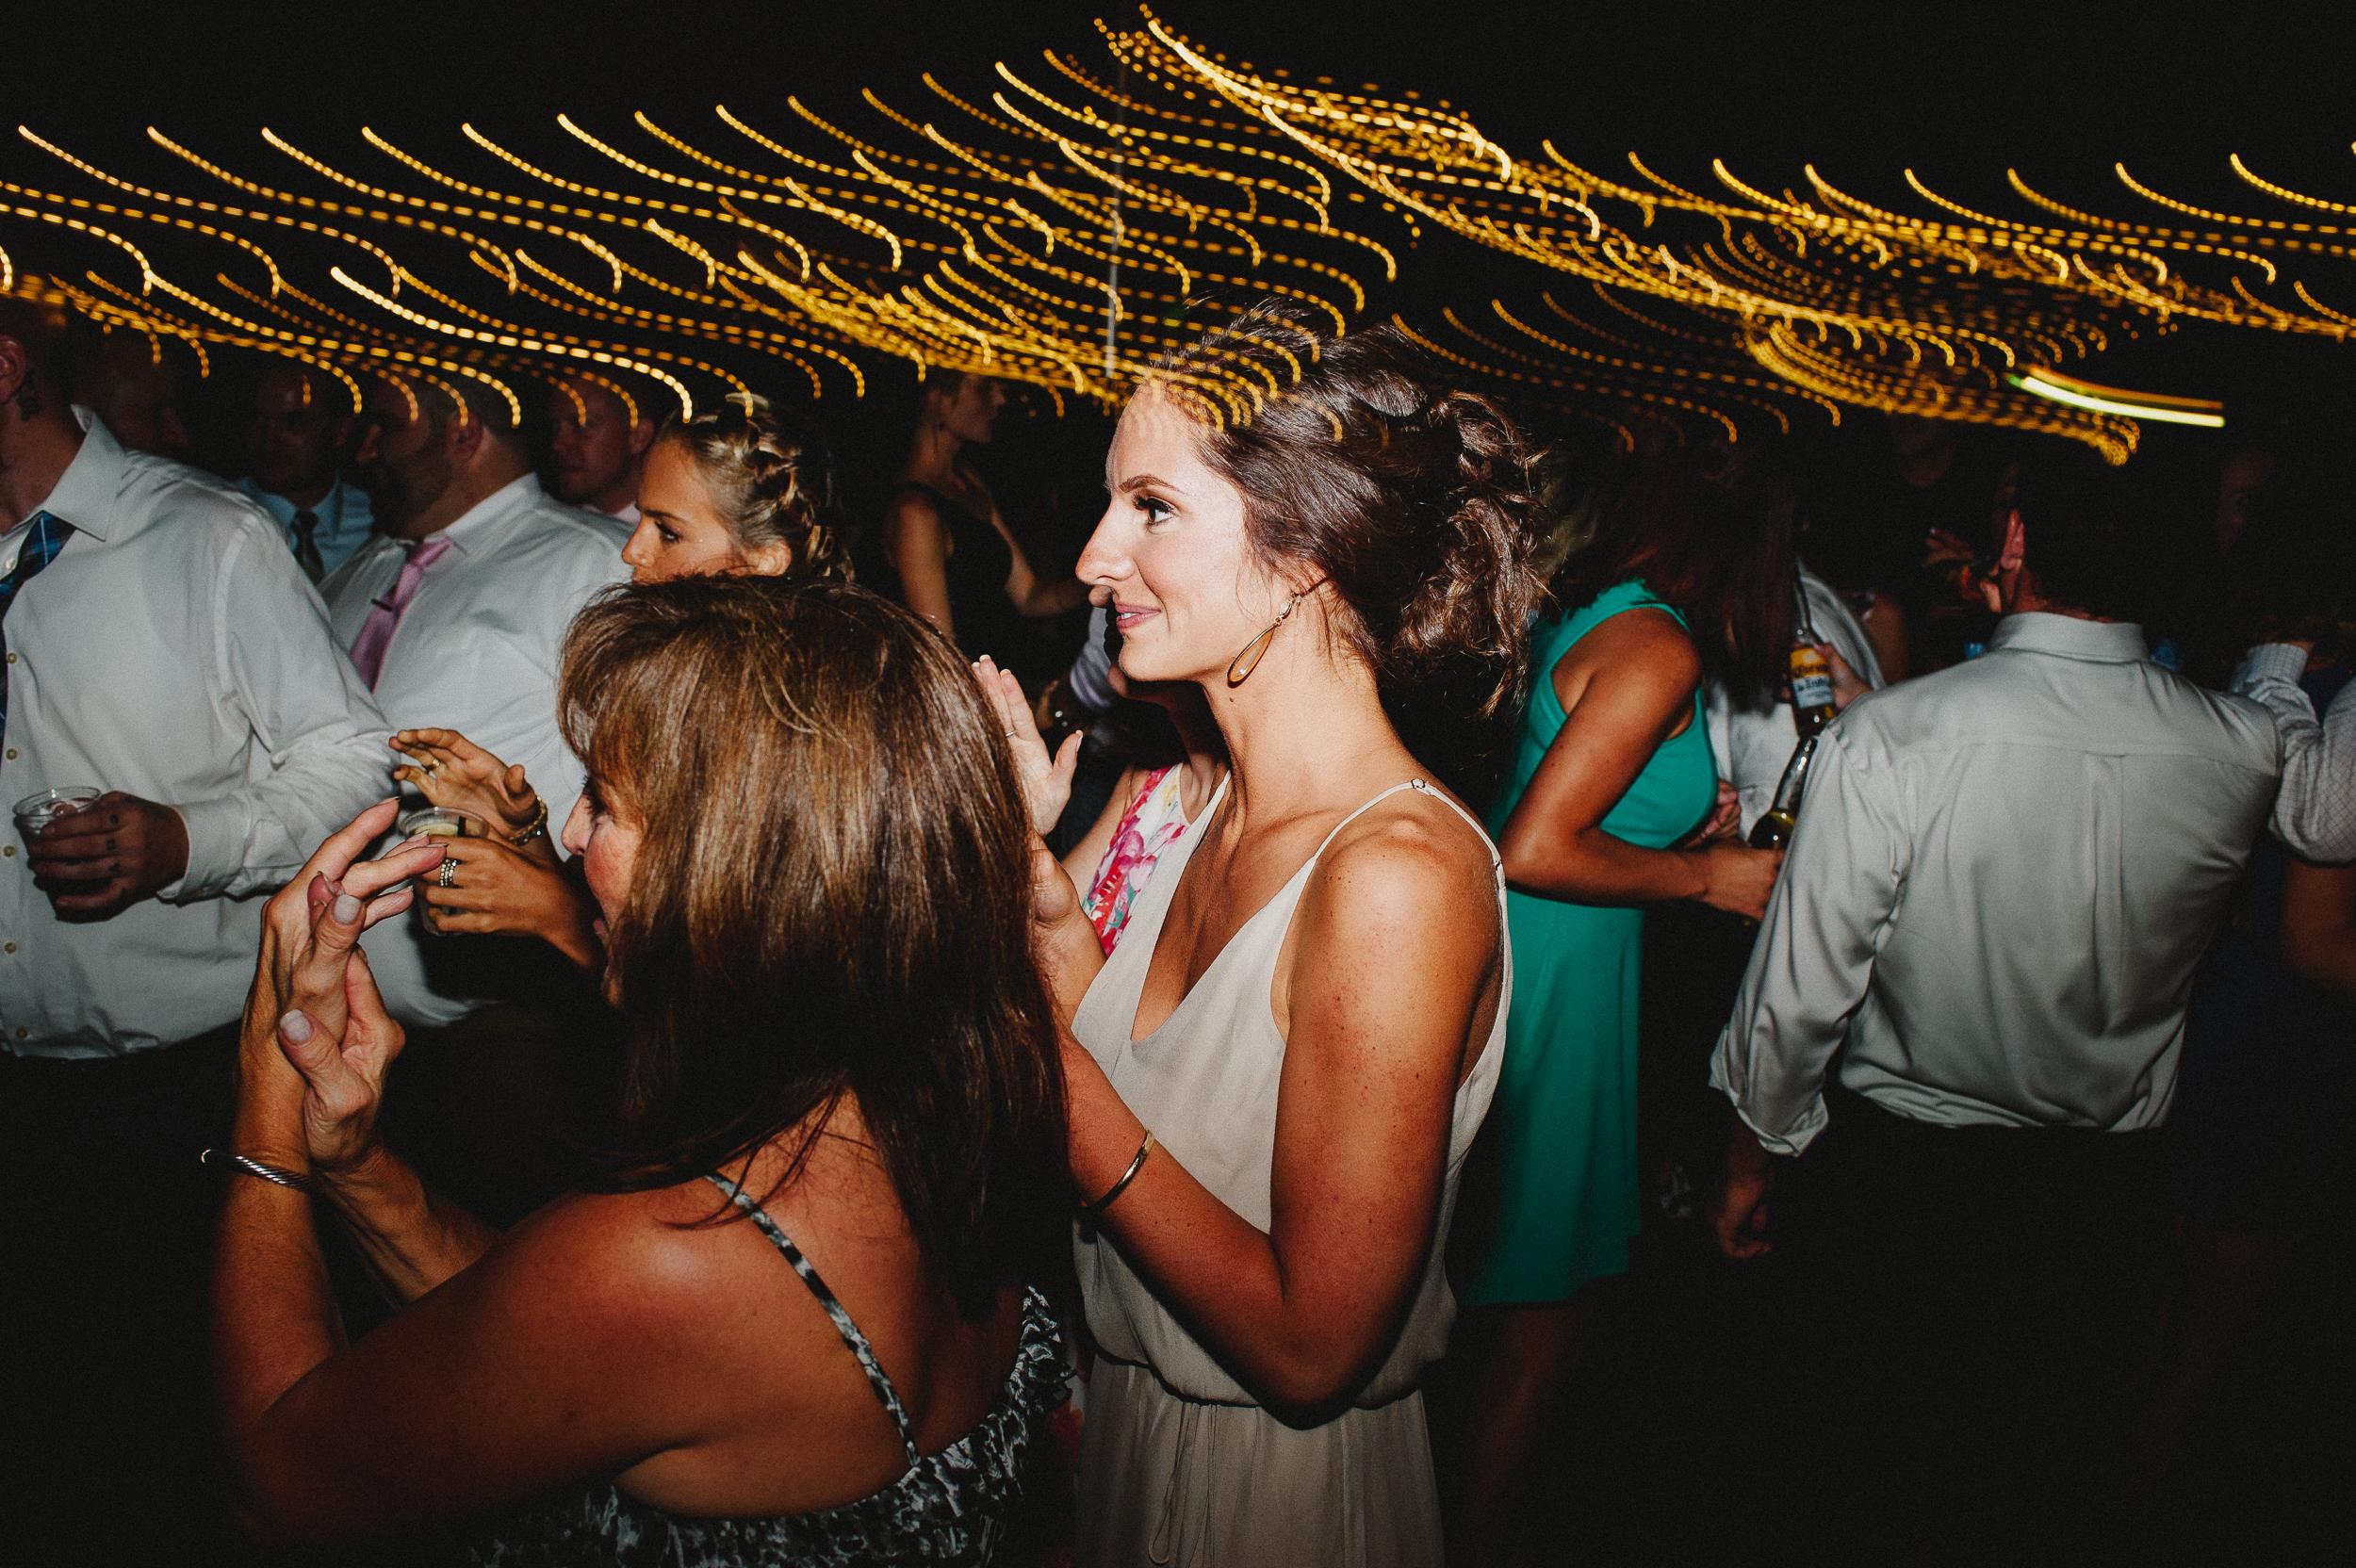 delaware-estate-wedding-photographer-pat-robinson-photography-132.jpg